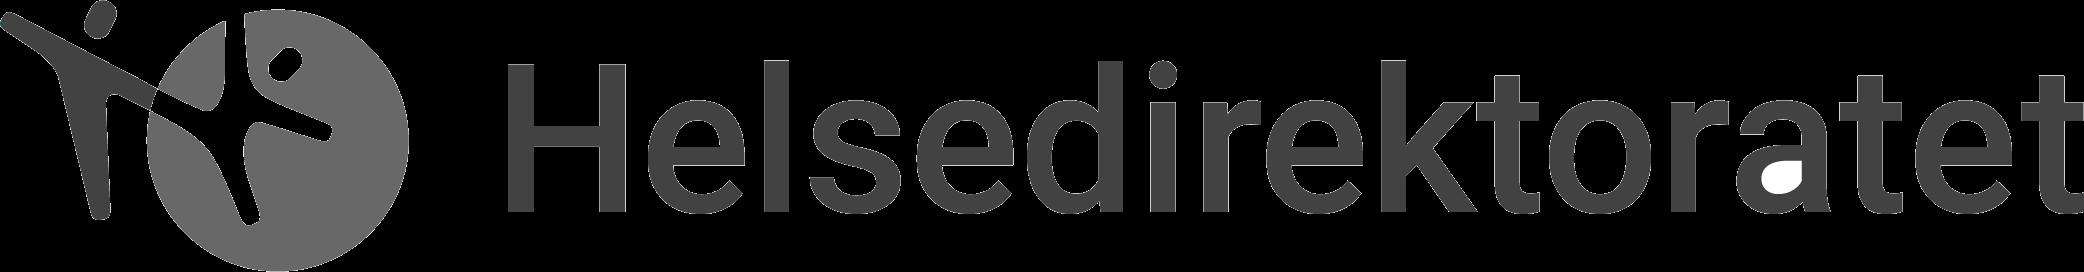 Helsedirektoratet logo-1